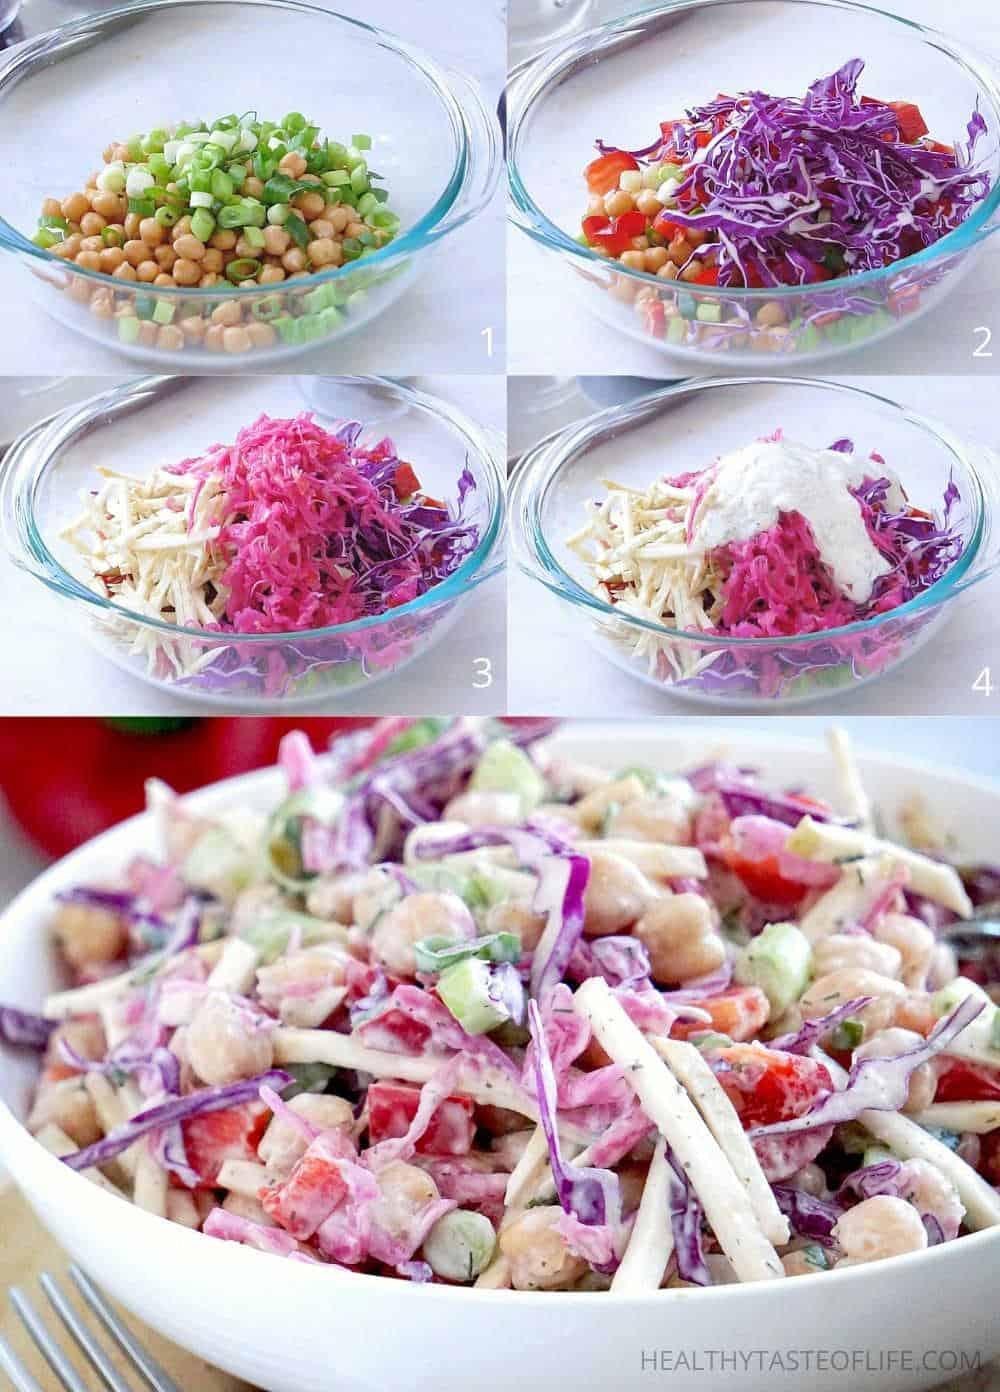 Vegan Chickpea Salad No Mayo With Red Cabbage and Sauerkraut